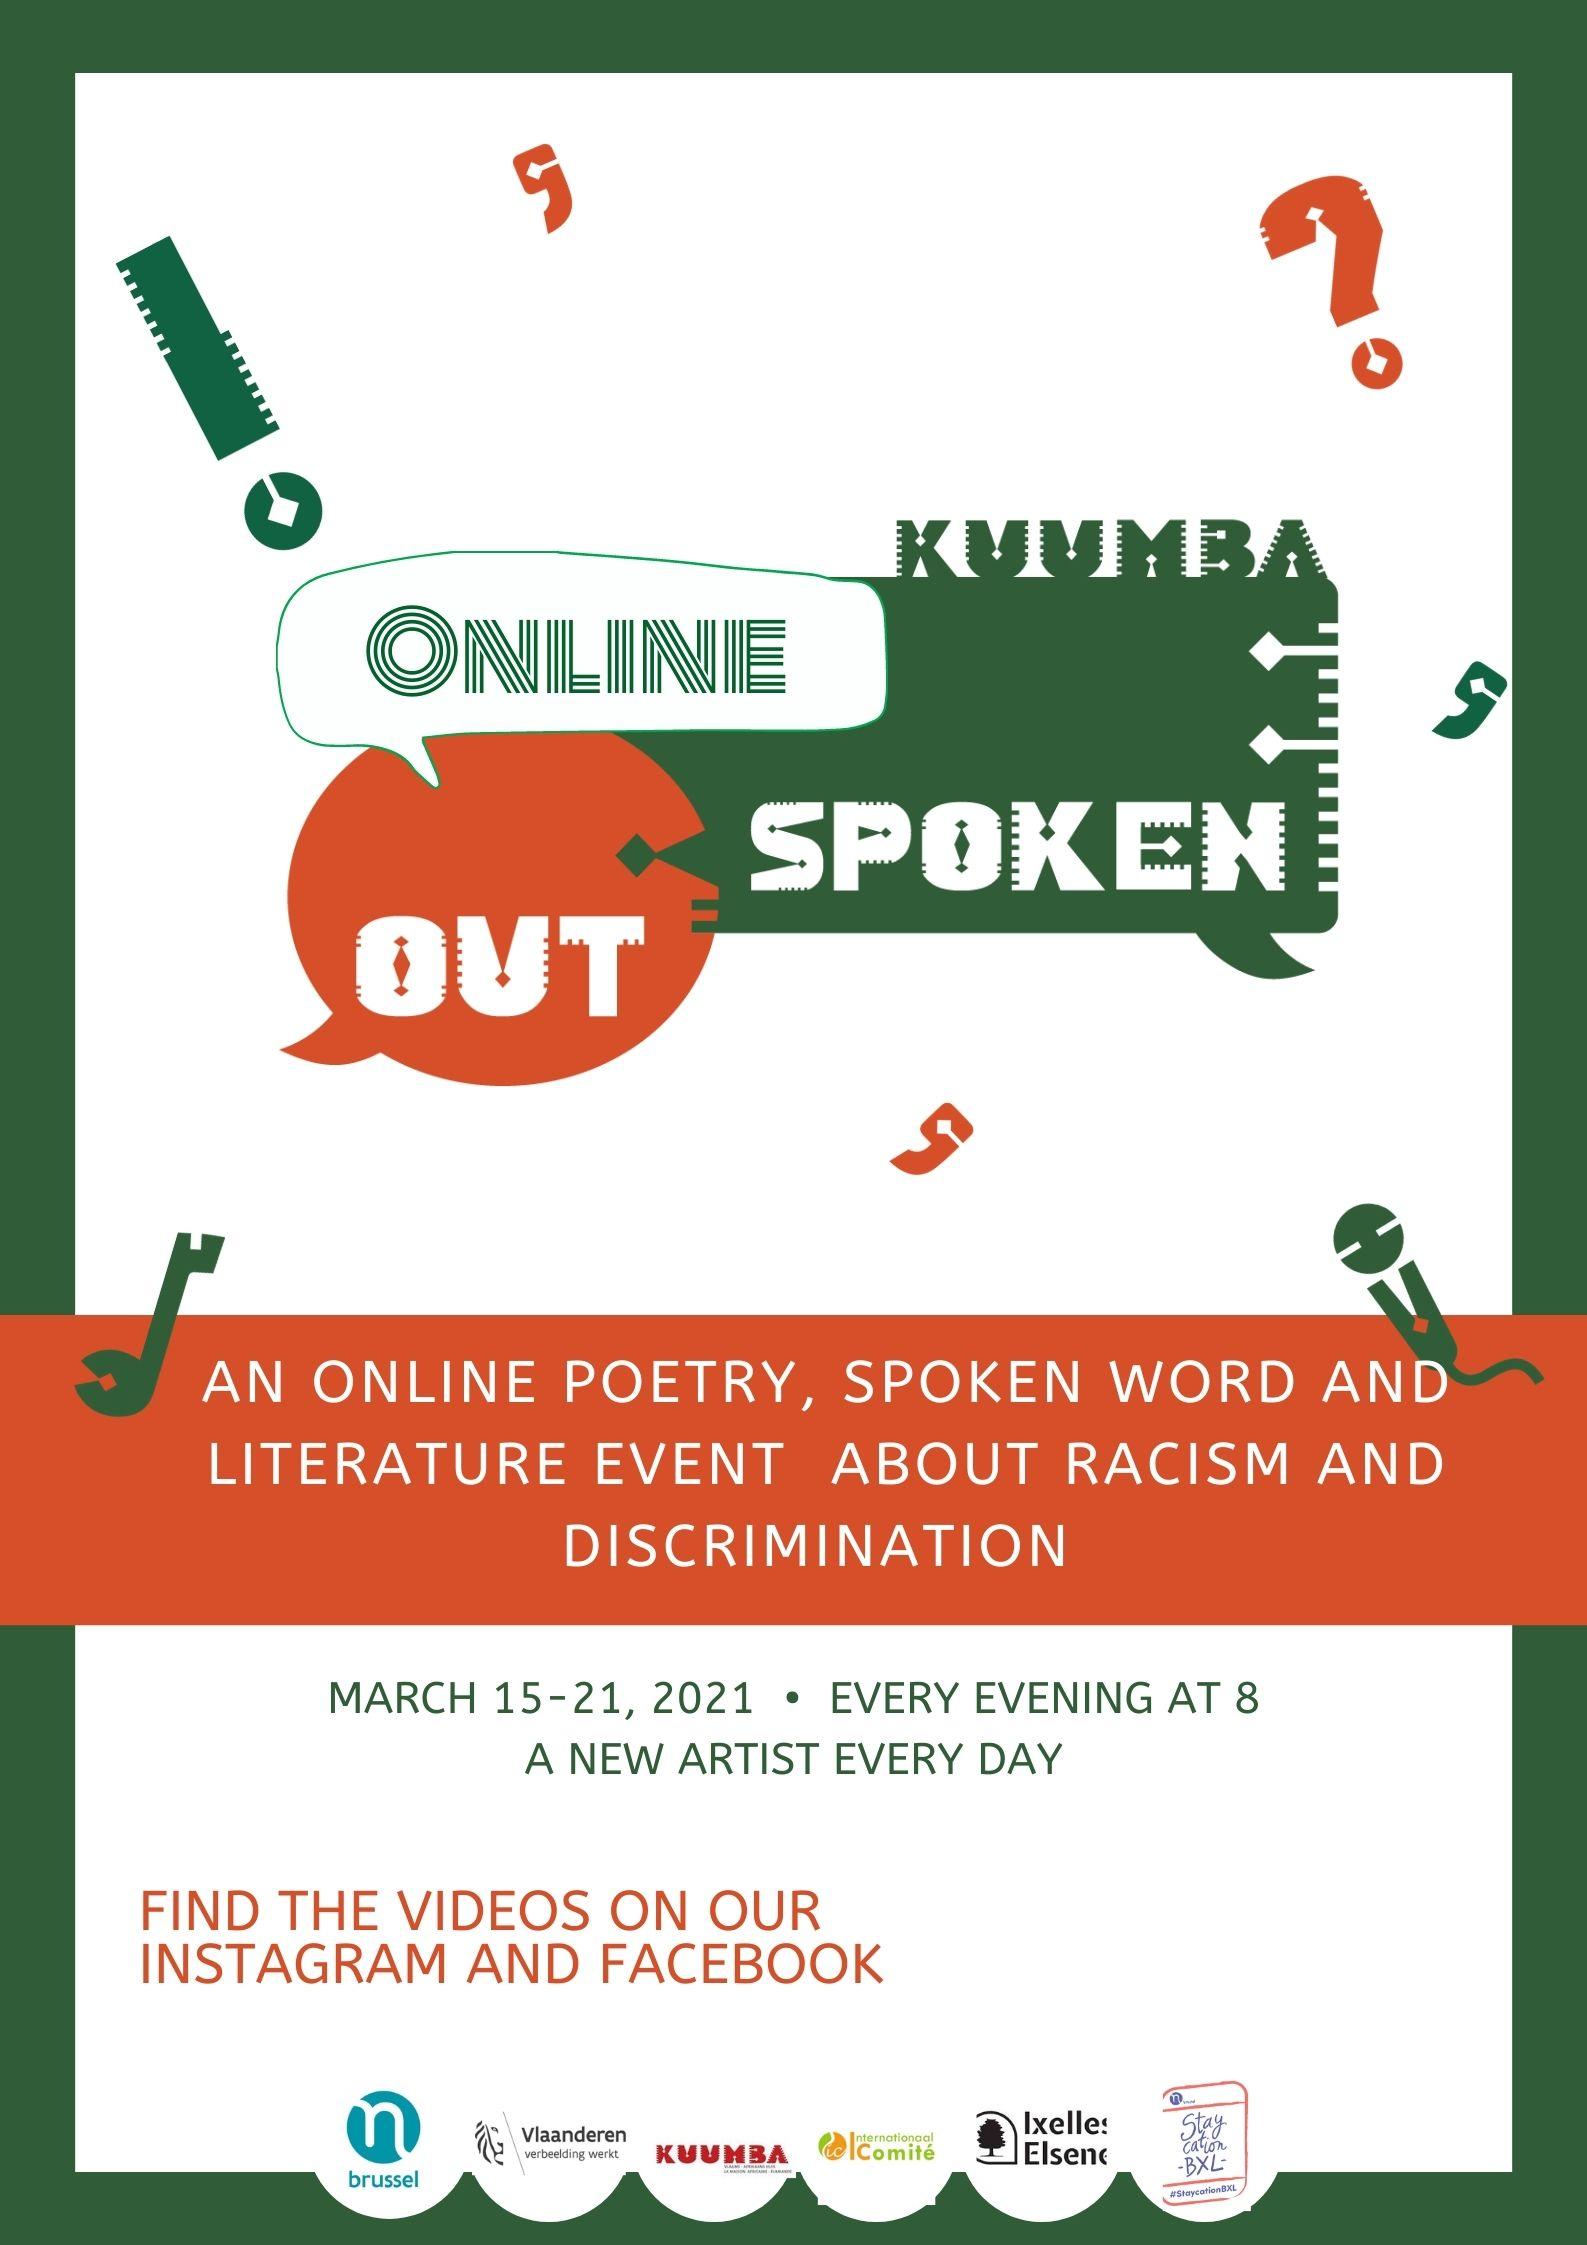 Outspoken Online